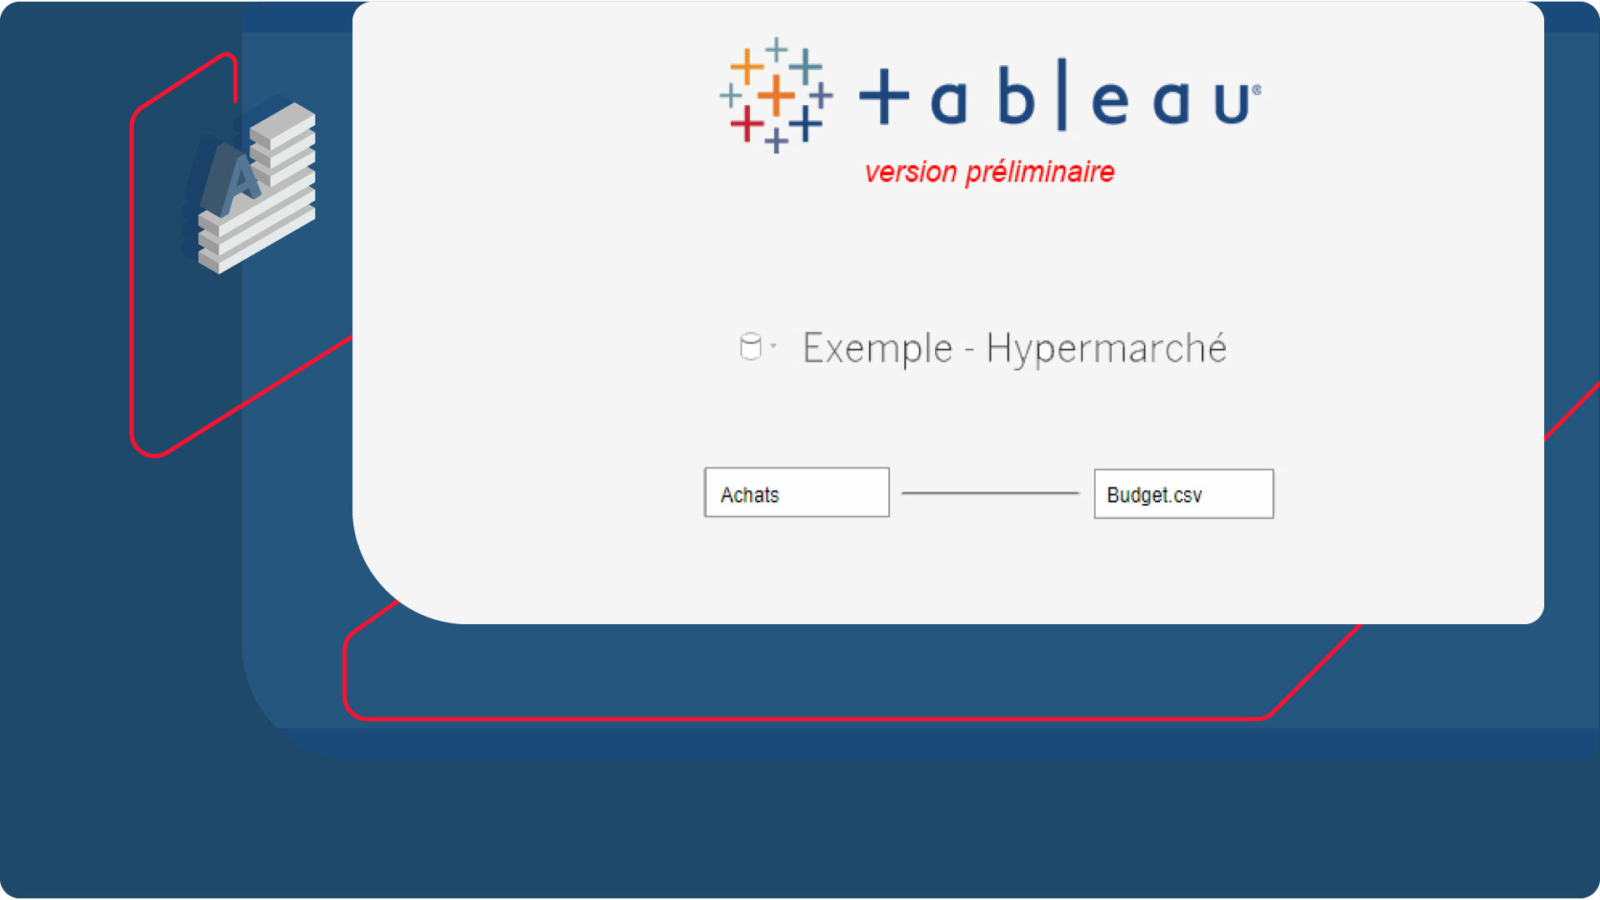 Blog-Poster-tableau-new-data-model